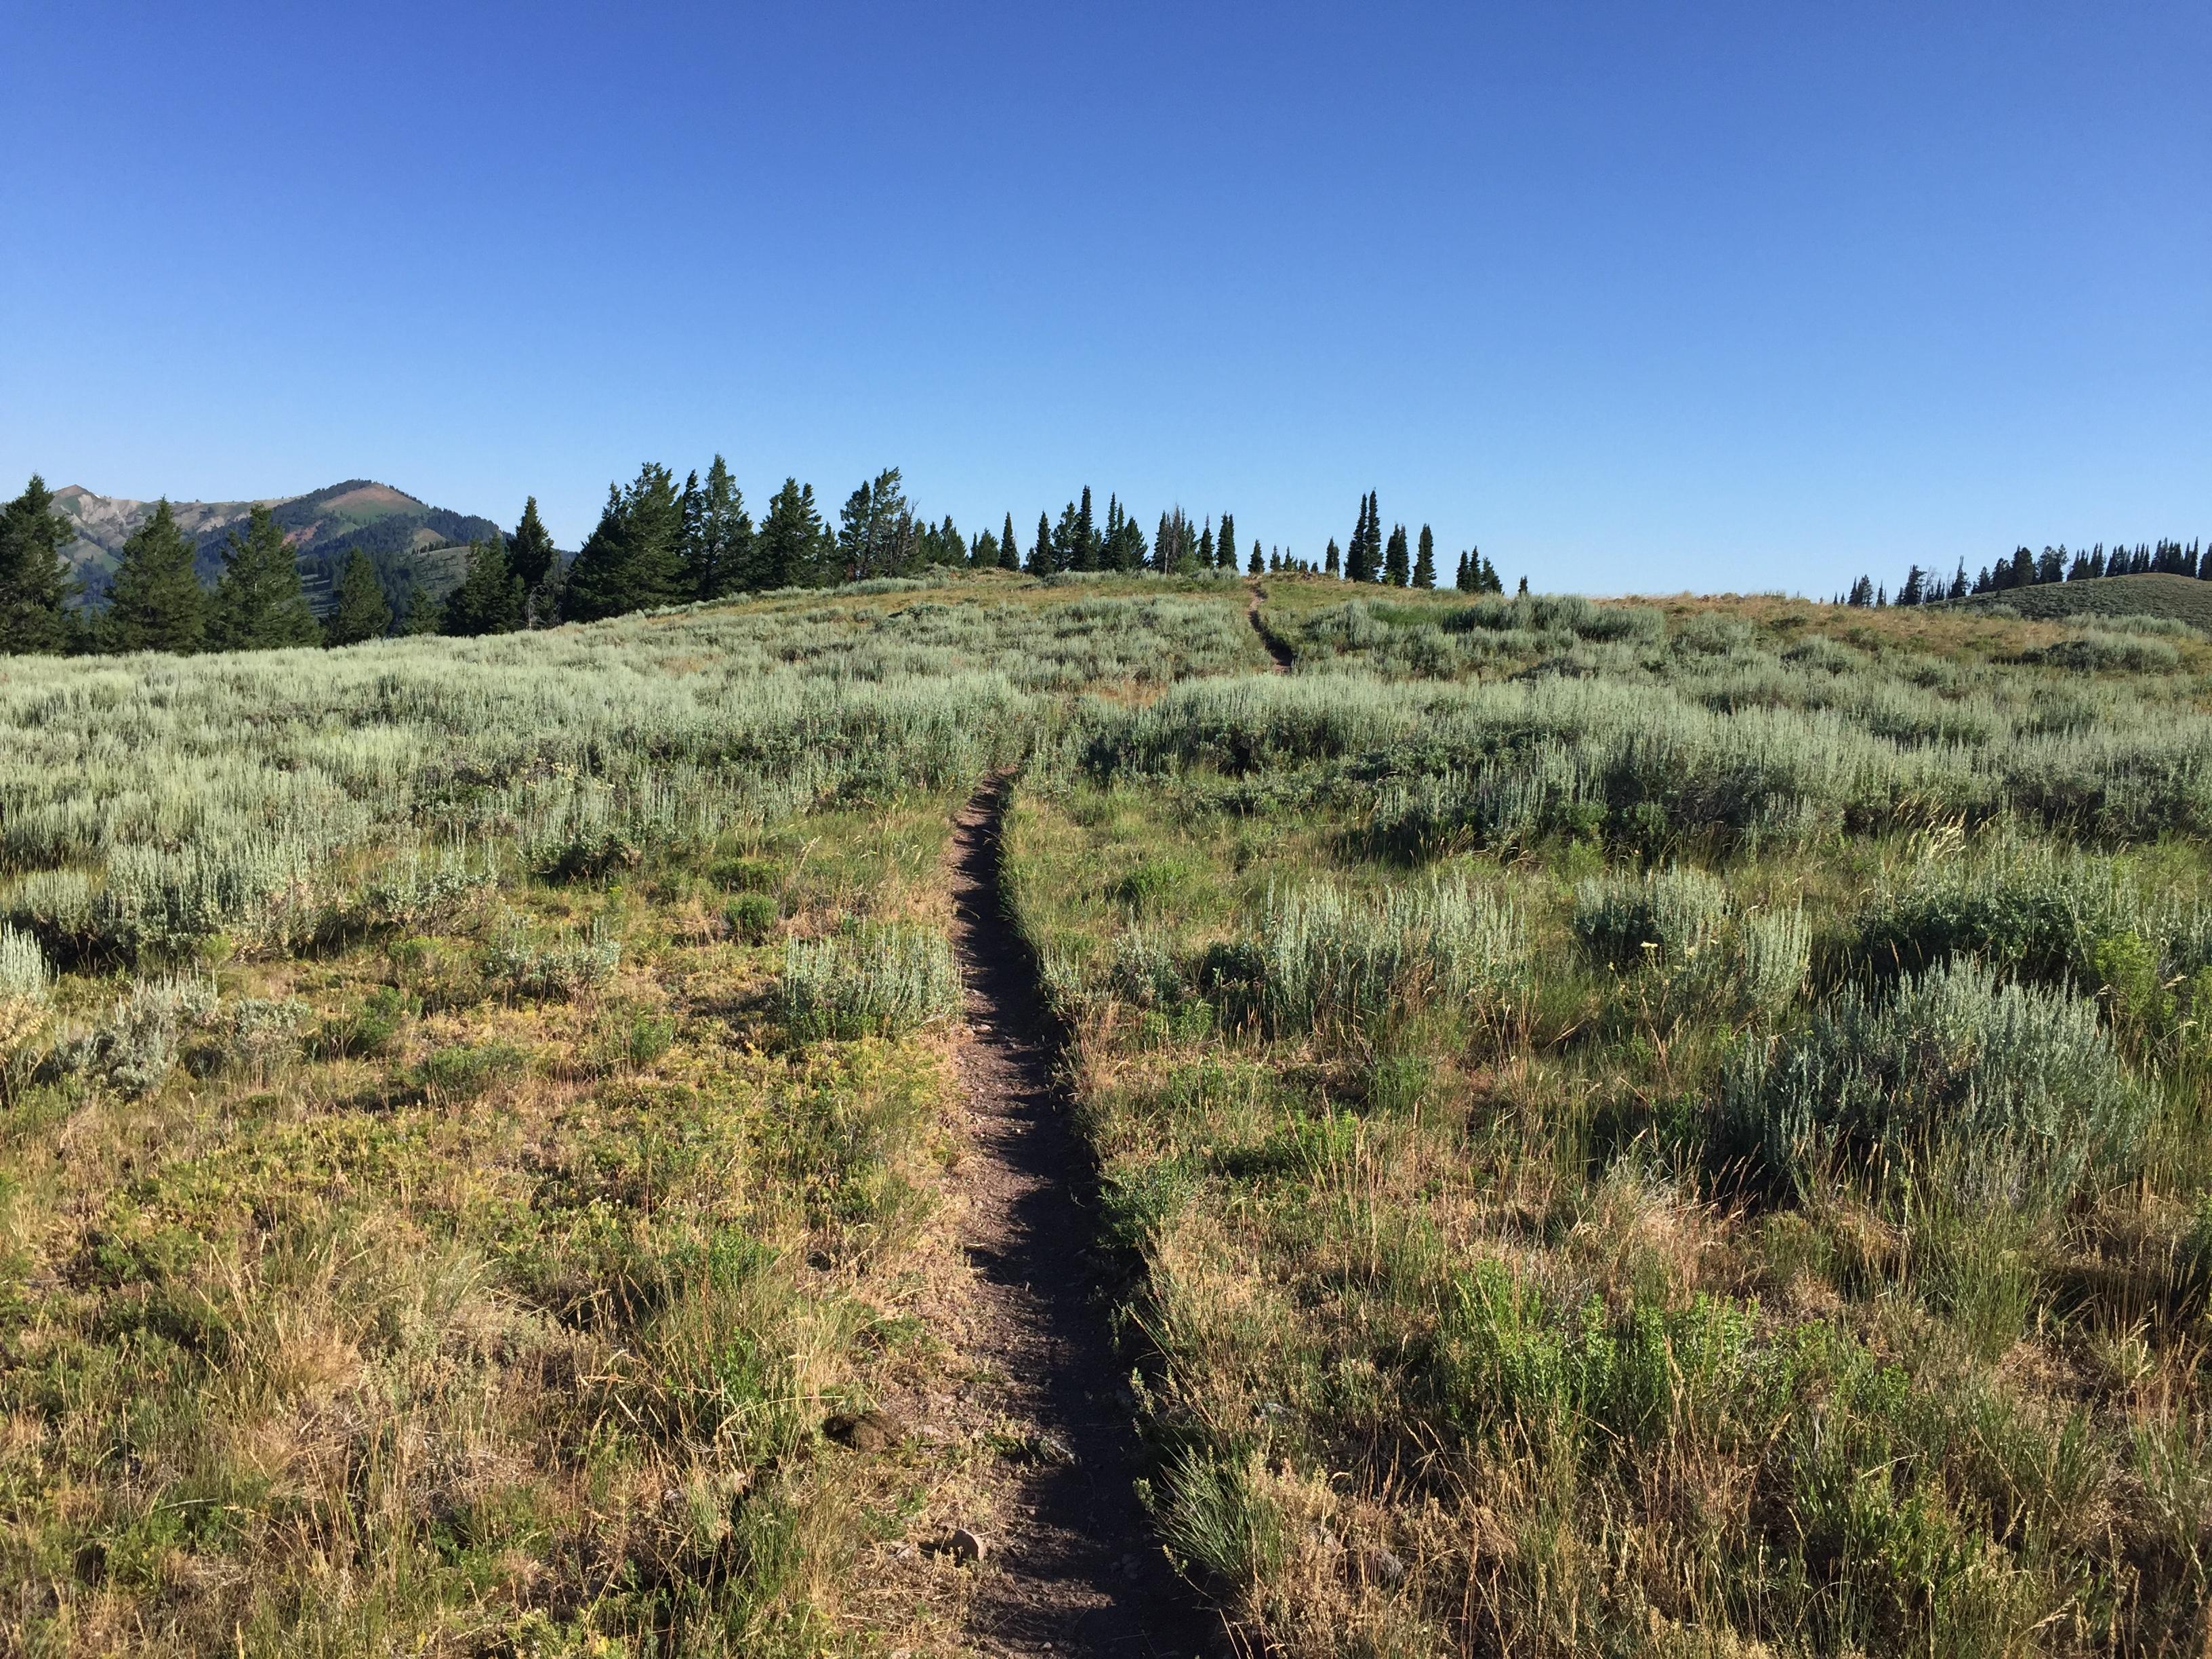 Approaching Peak 7800 from Pine Creek Summit.